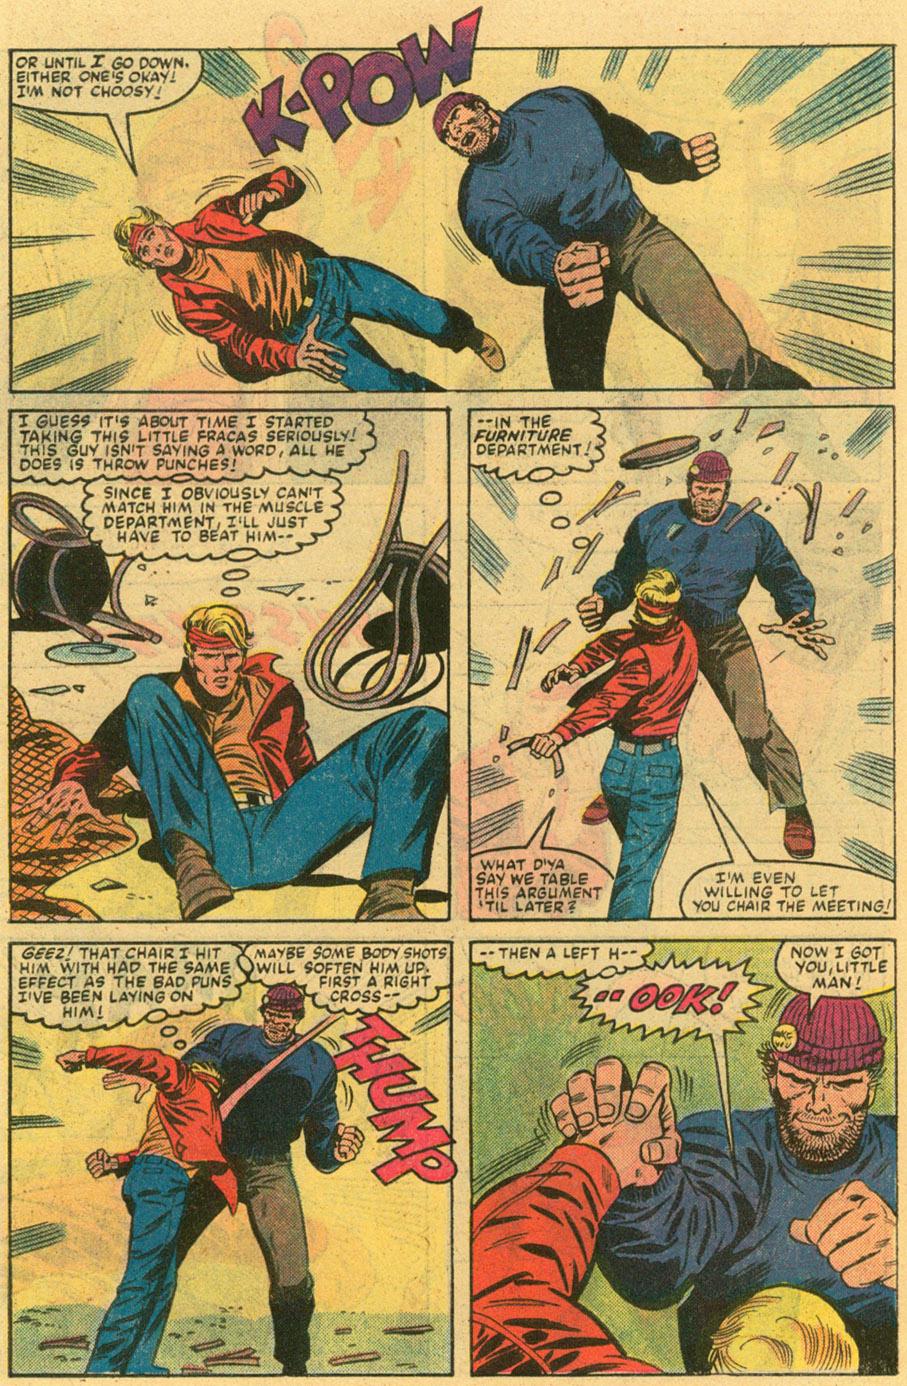 Read online U.S. 1 comic -  Issue #2 - 6